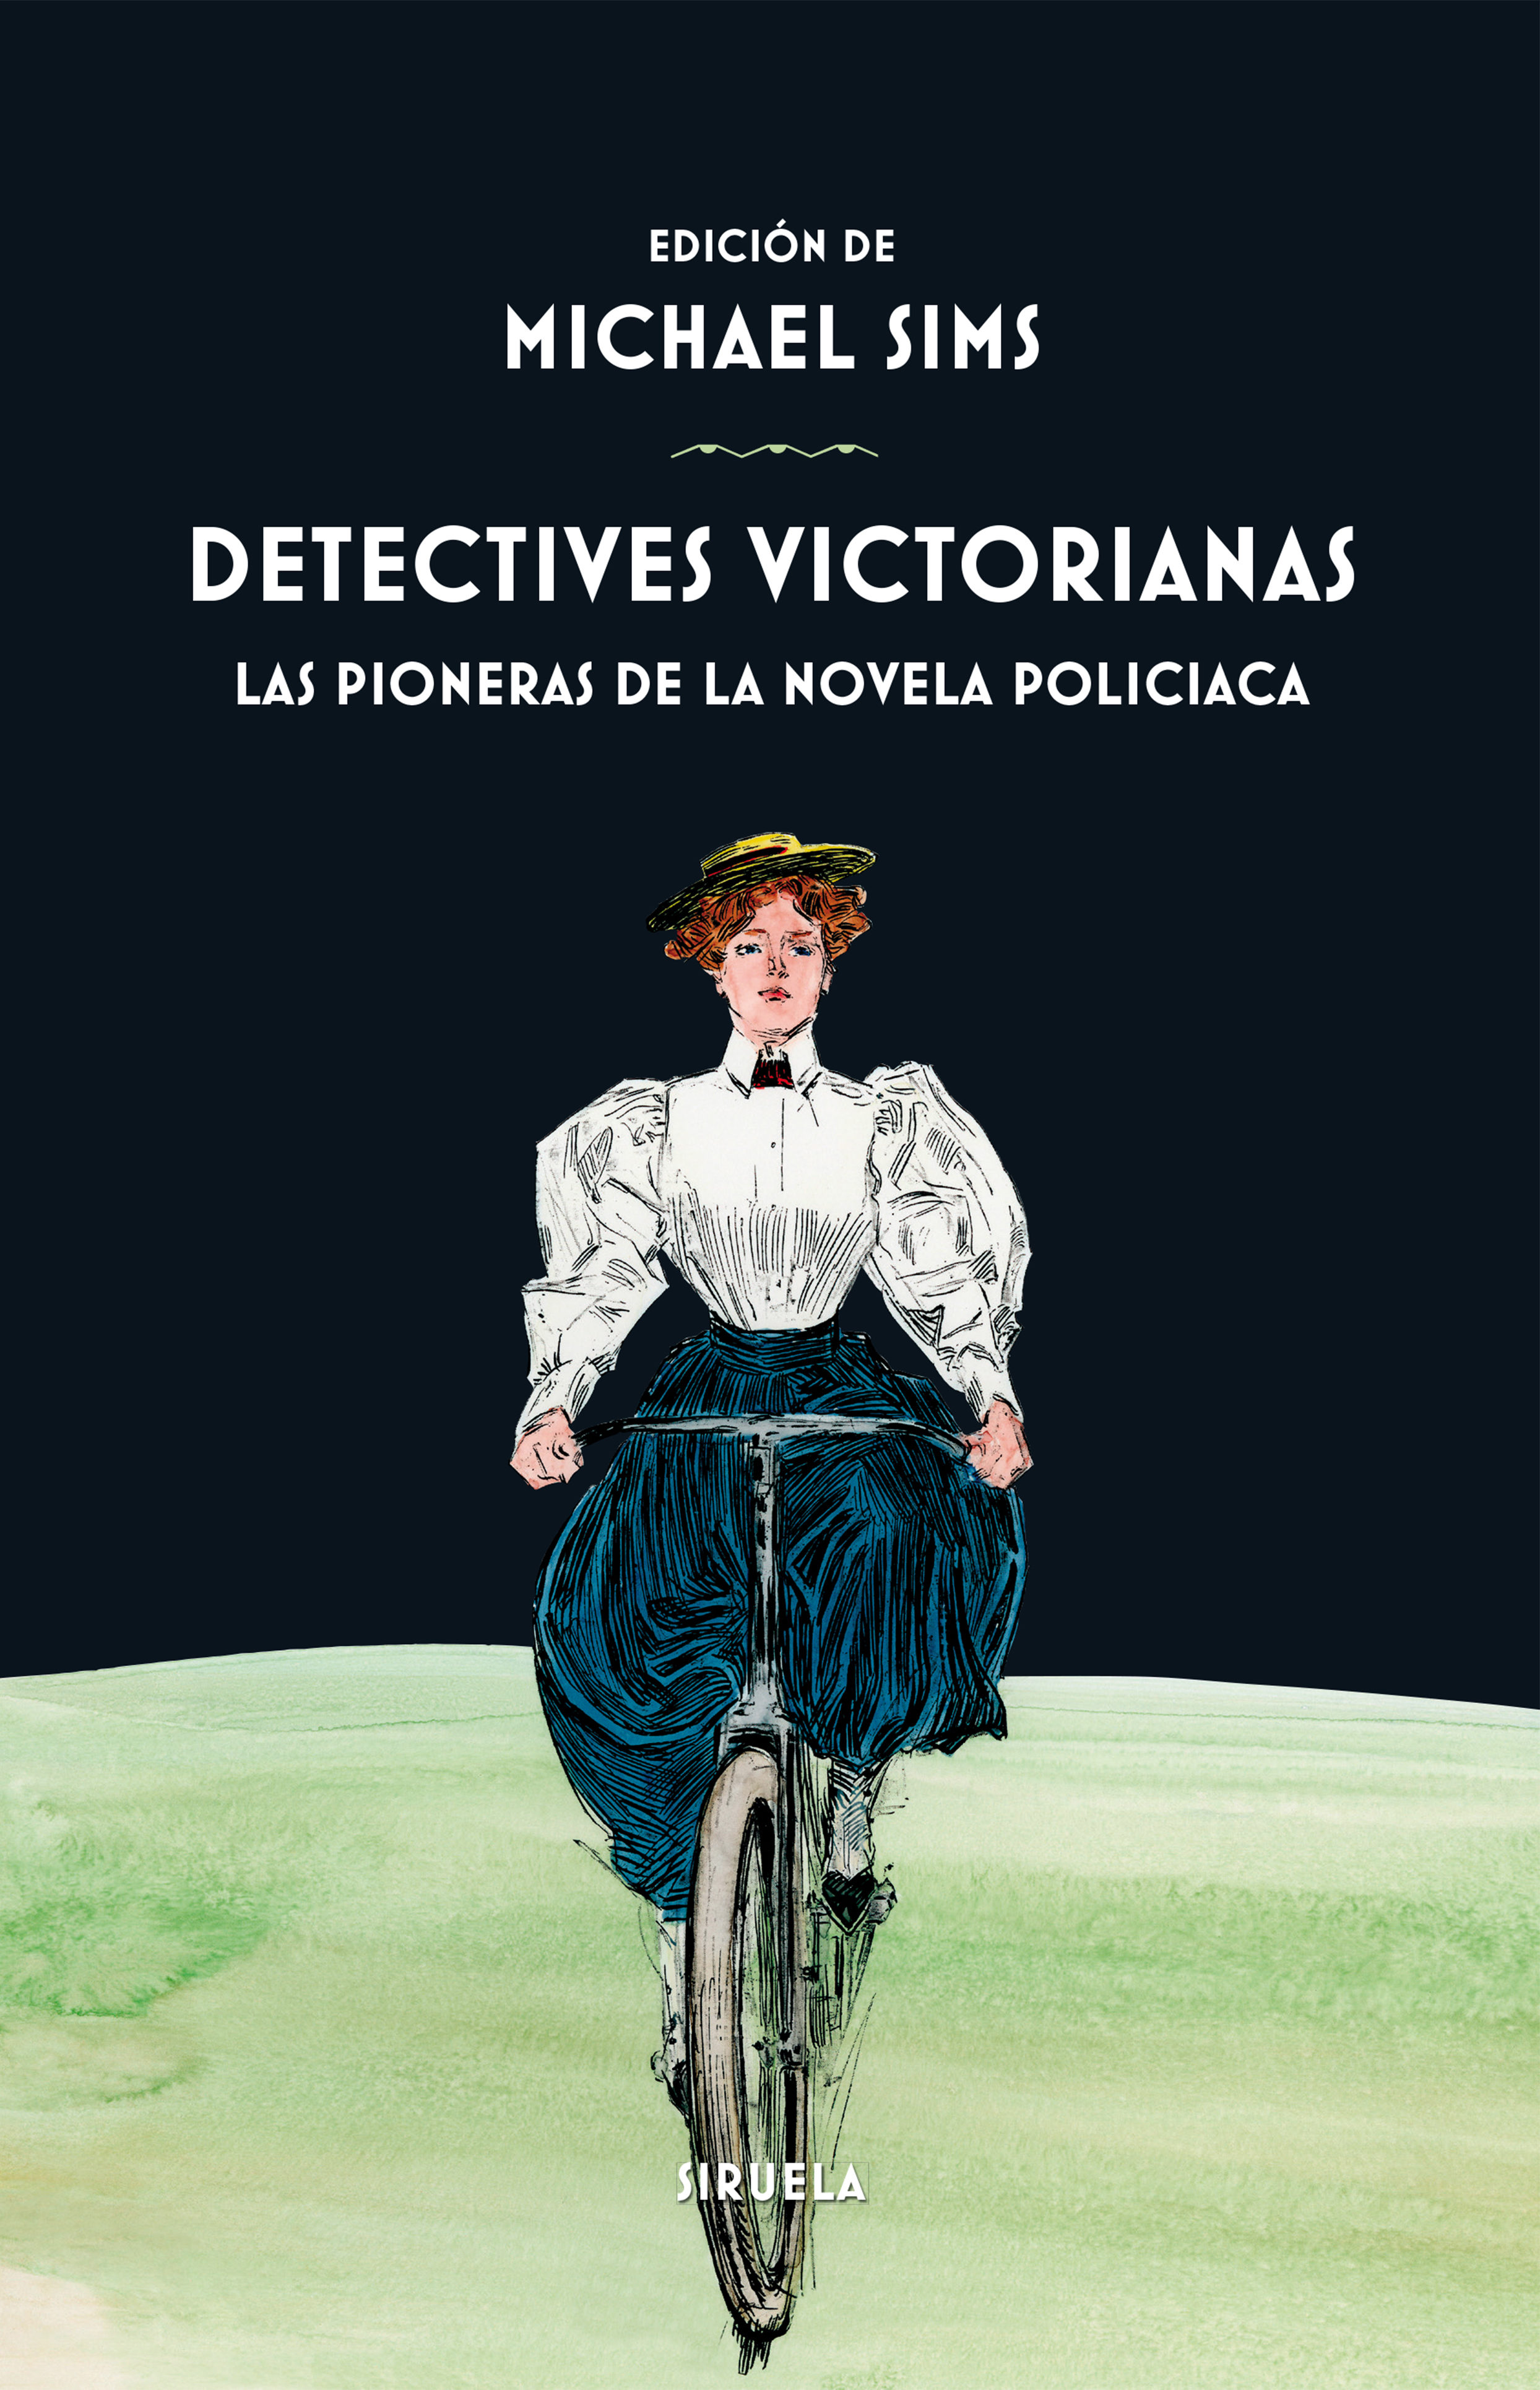 detectives victorianas-michael sims-9788417308001